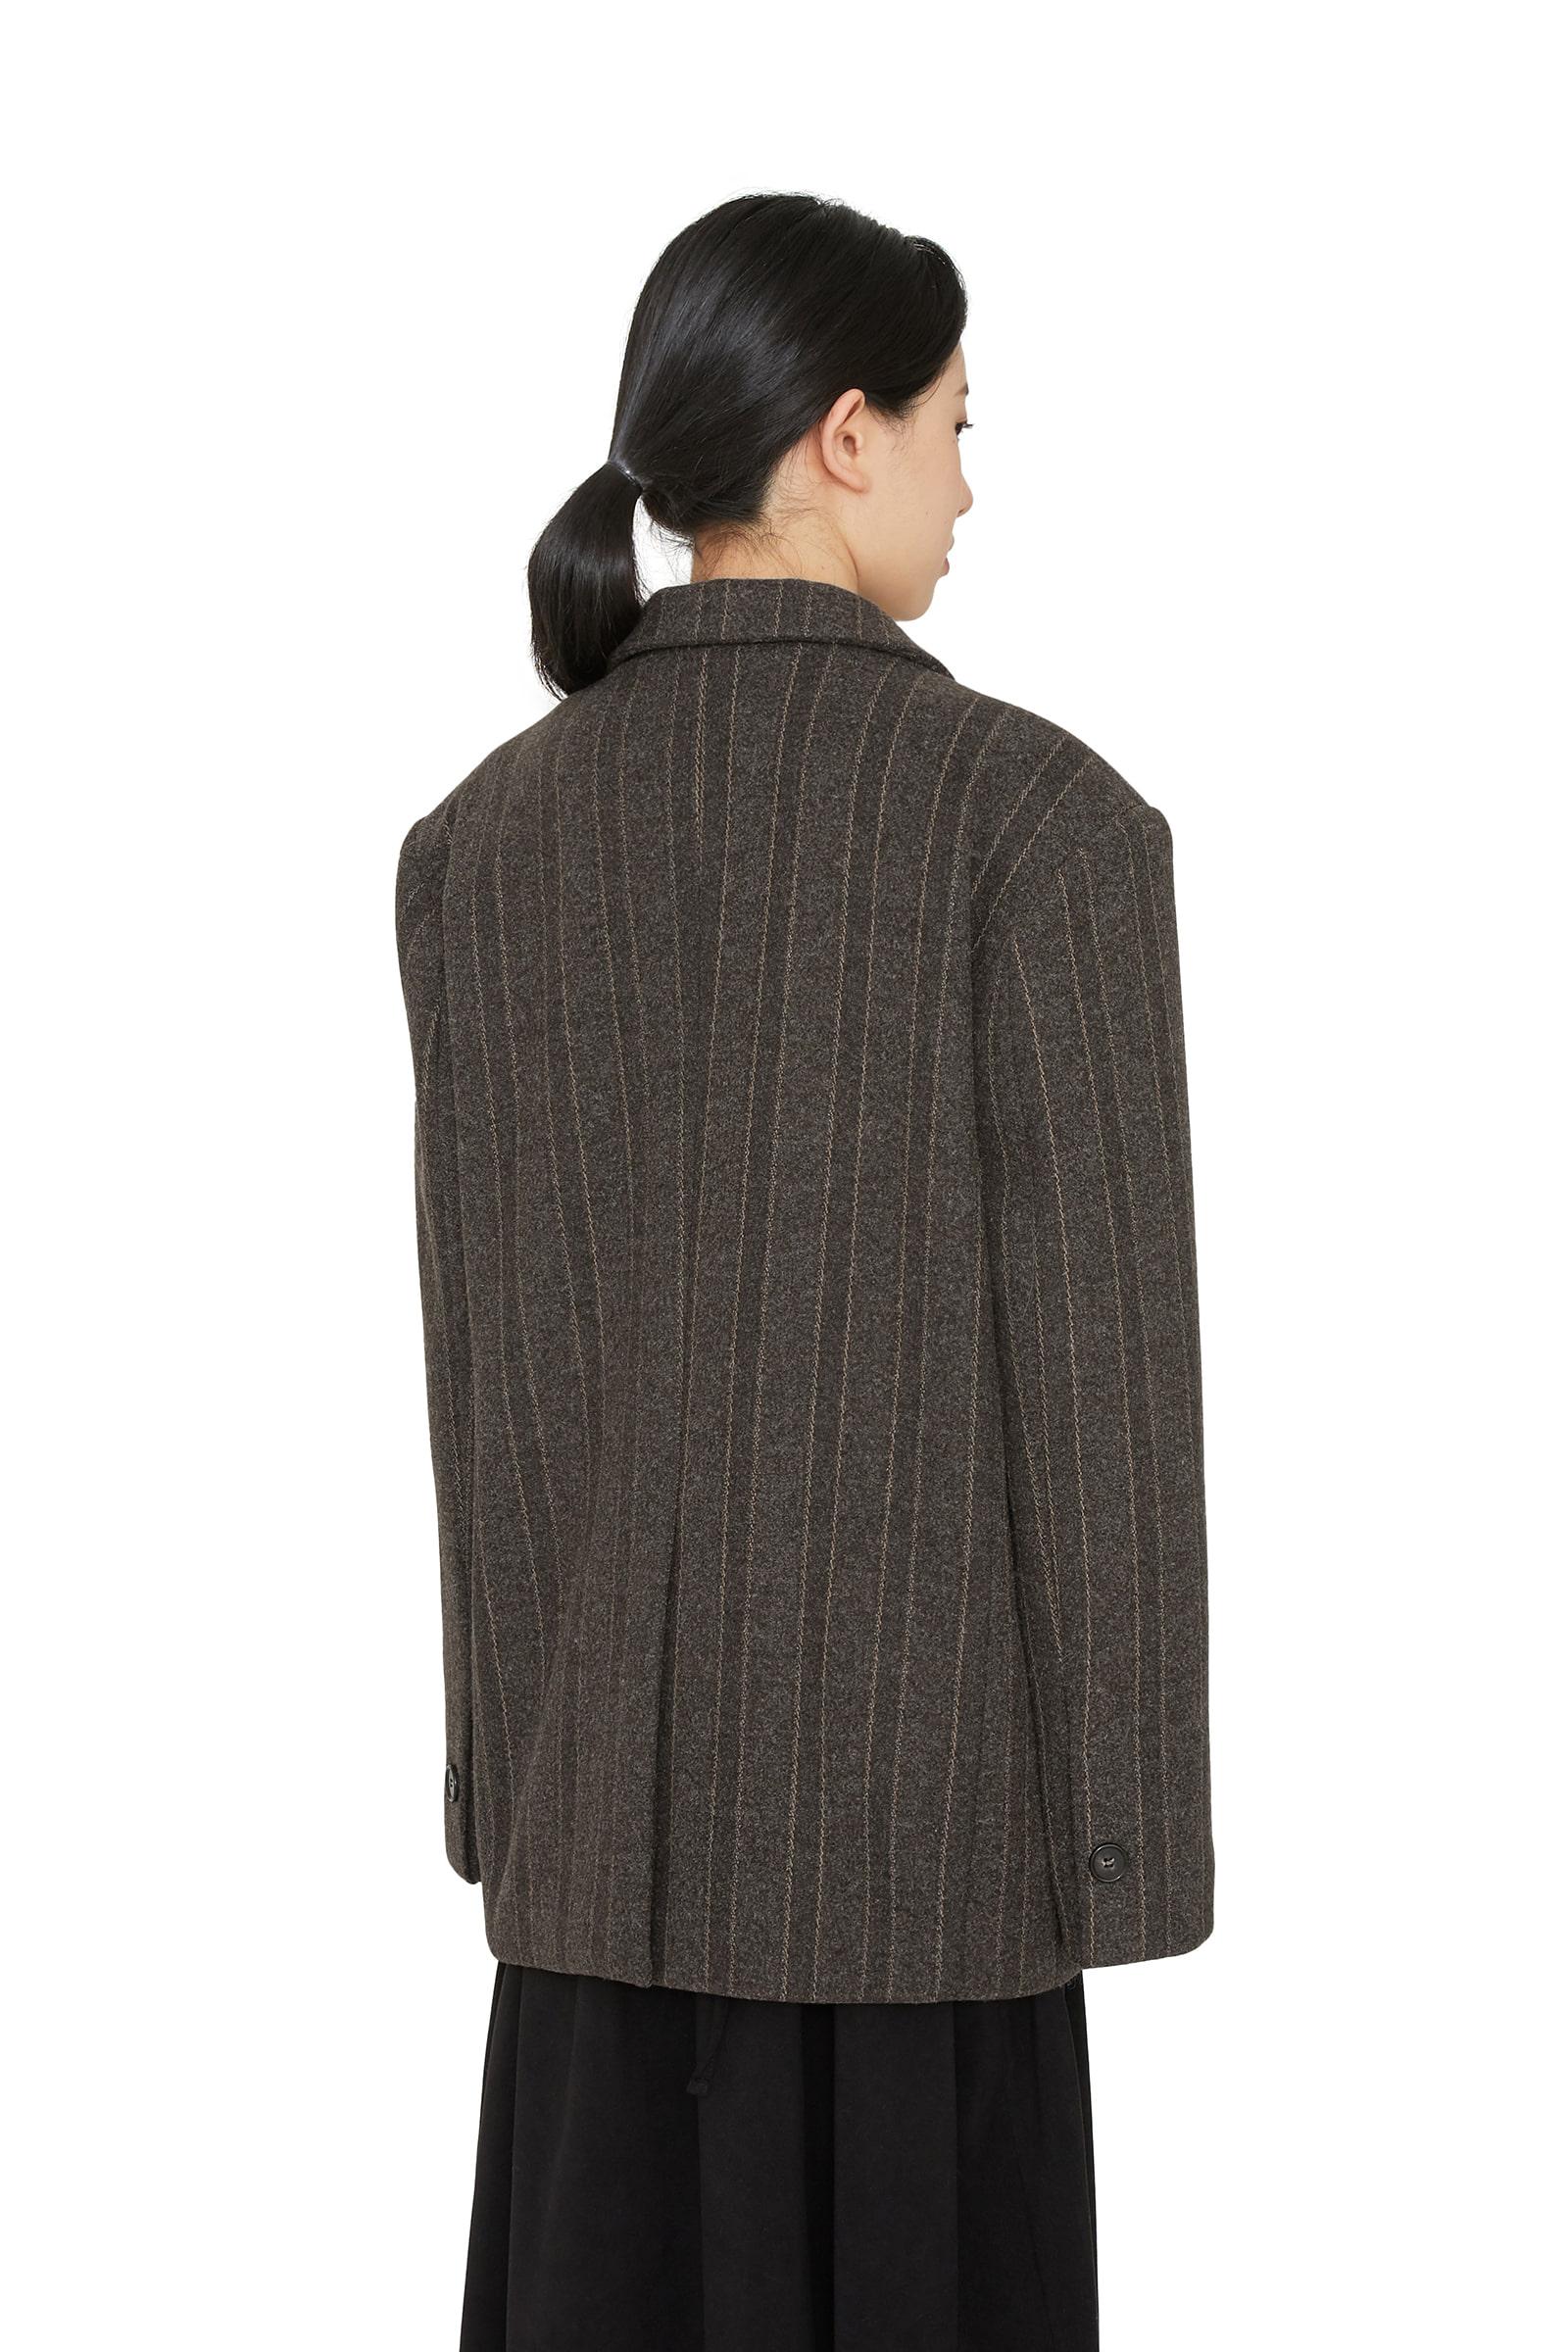 Jackpot pattern wool blazer